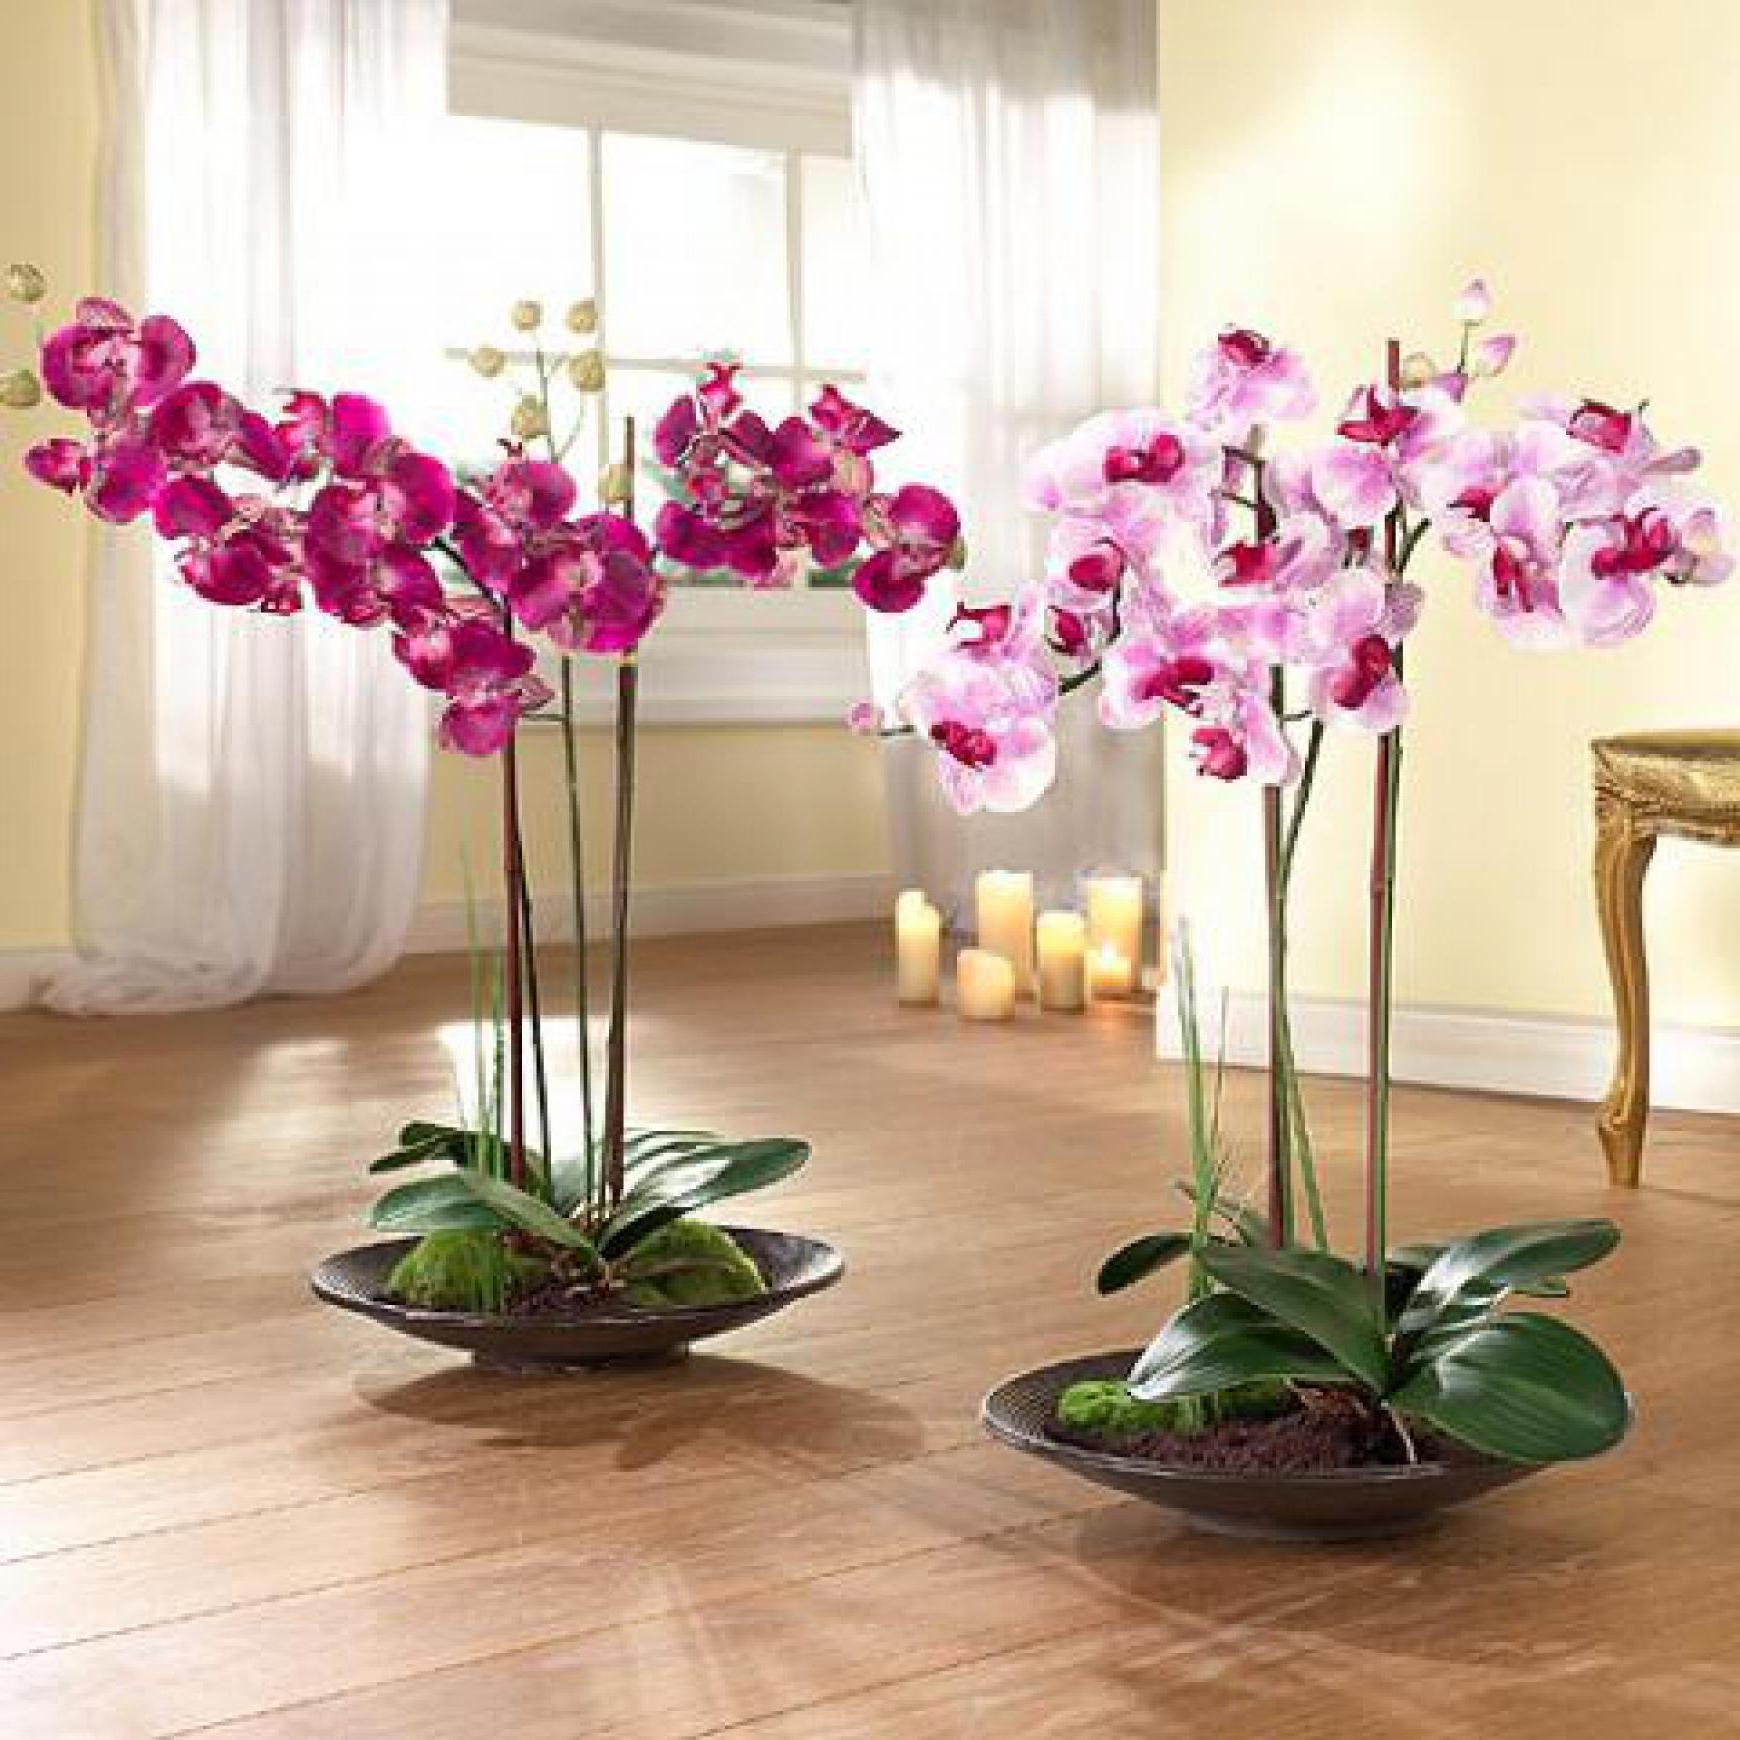 ideale t pfe f r orchideen wie w hlt man ideale orchideen topfe wahlt blumen und pflanzen. Black Bedroom Furniture Sets. Home Design Ideas